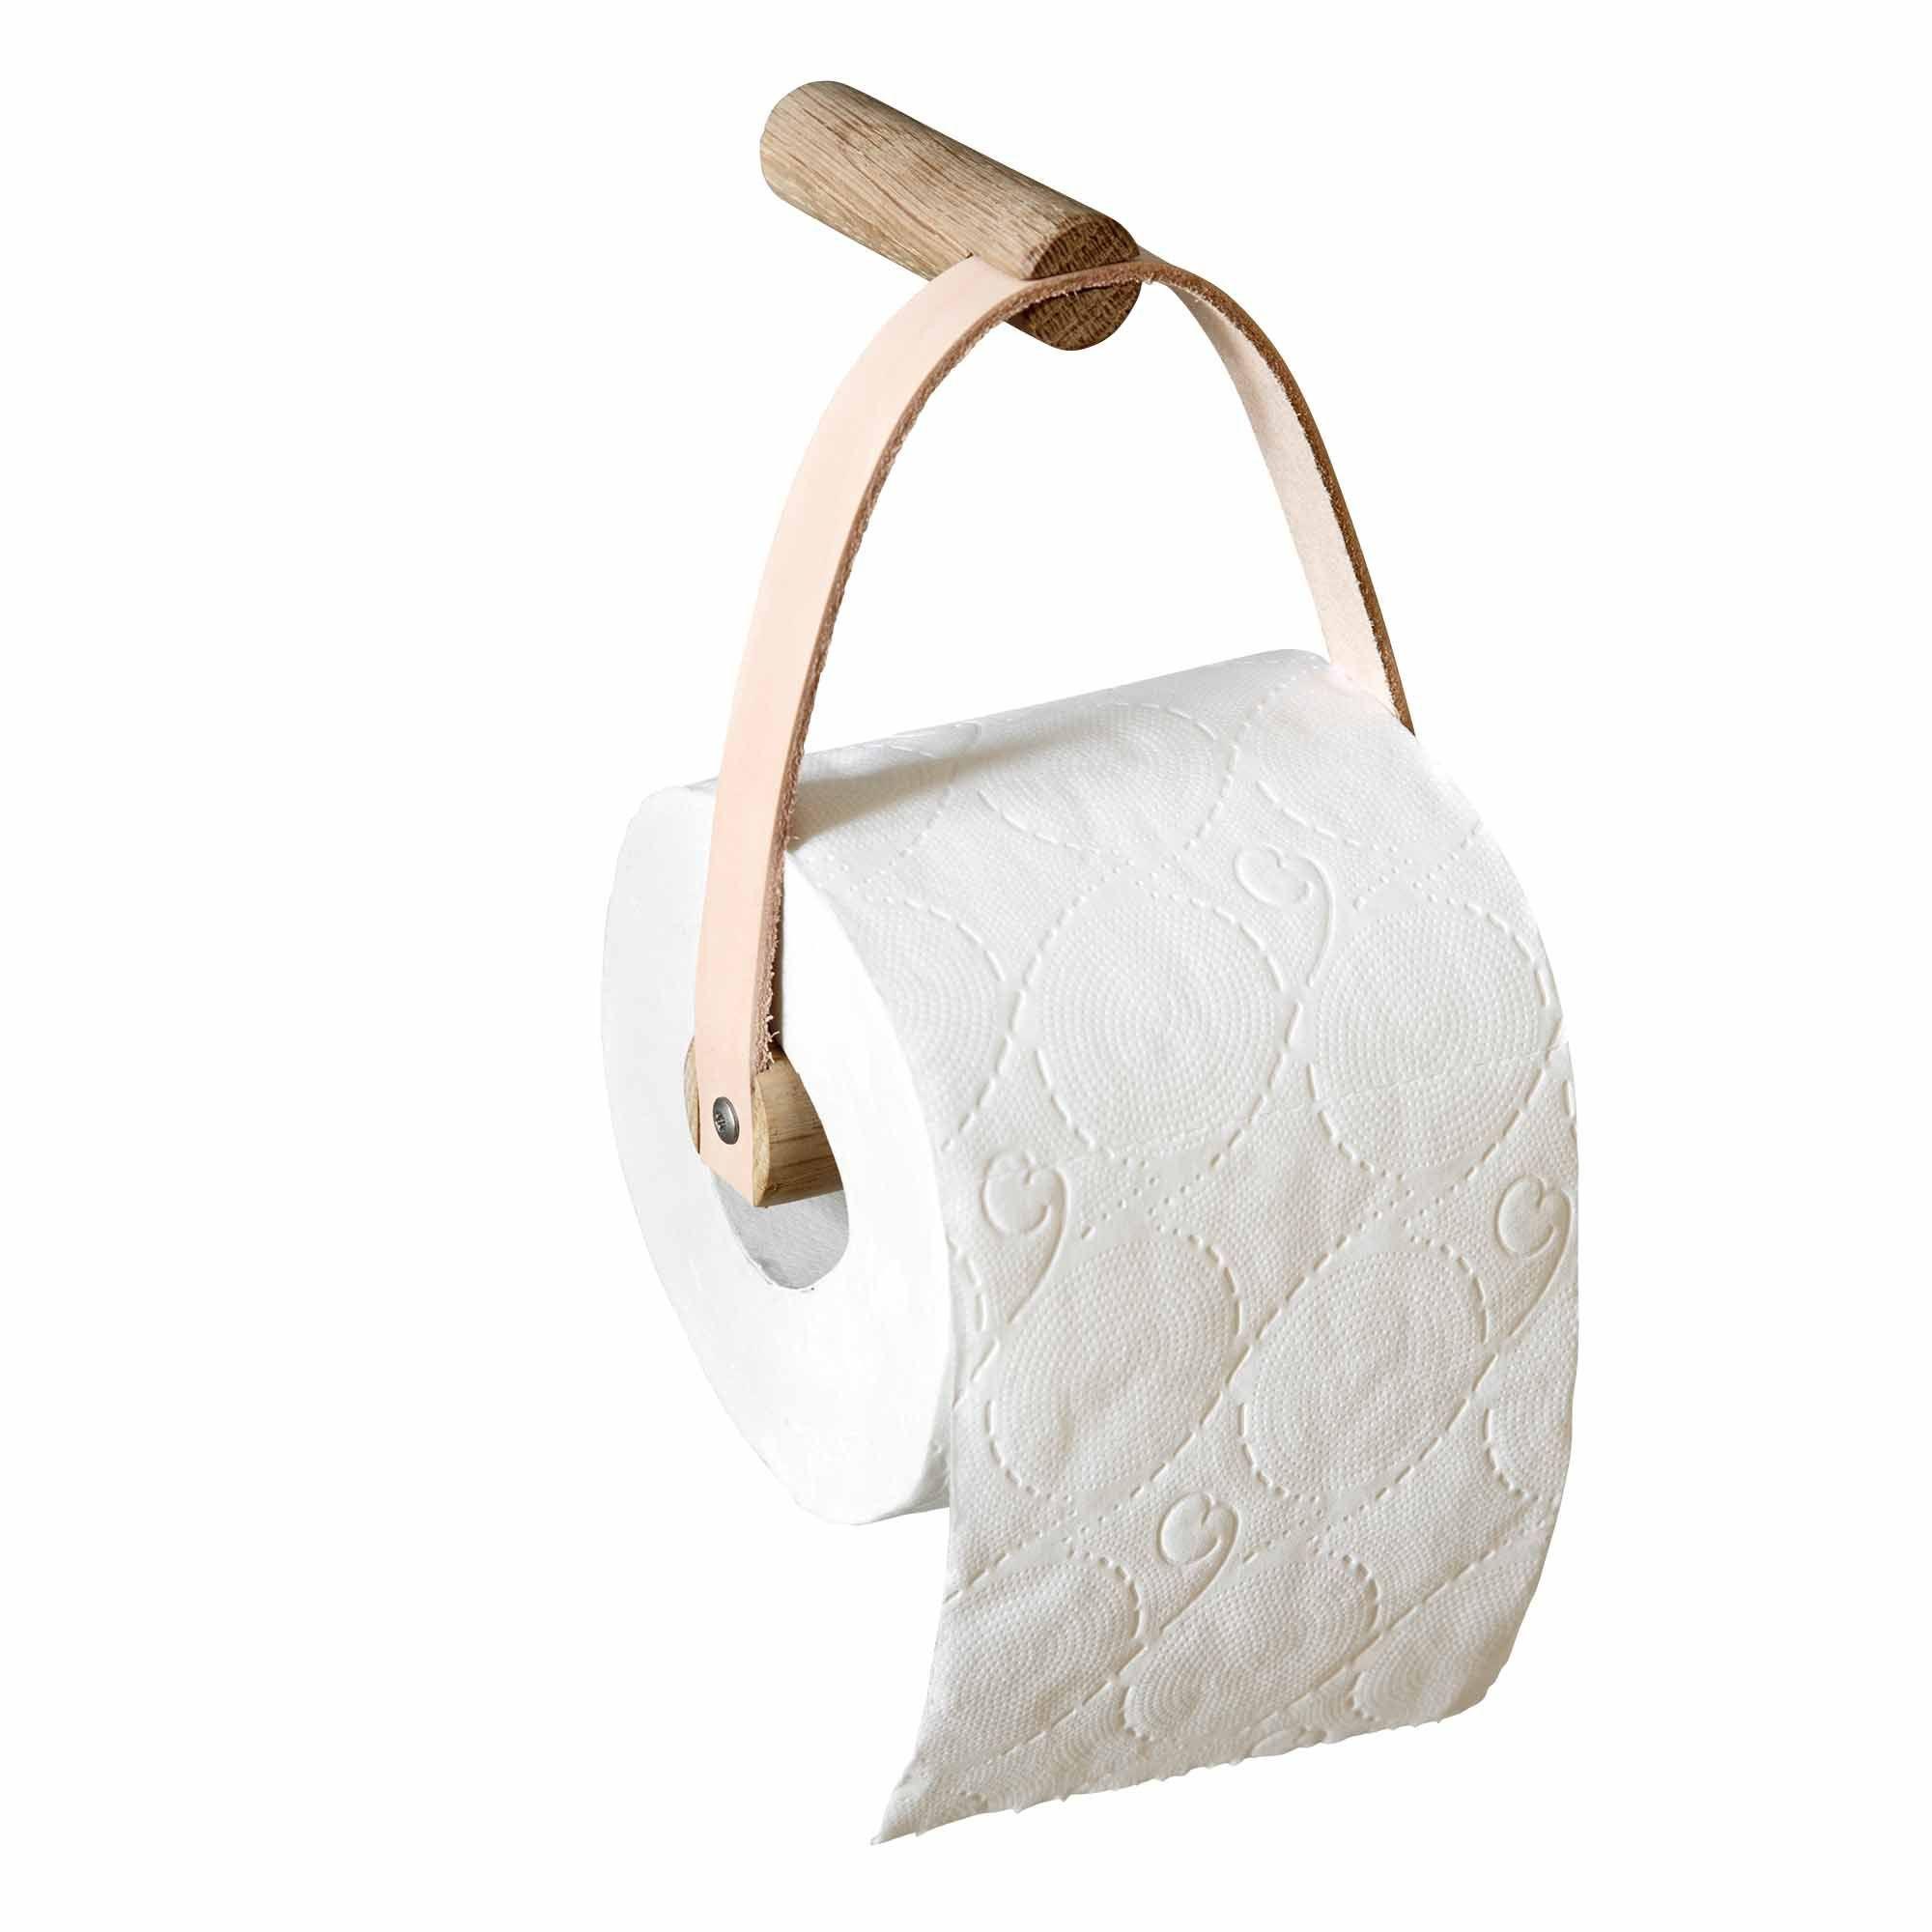 Toilettenpapierhalter | Natur